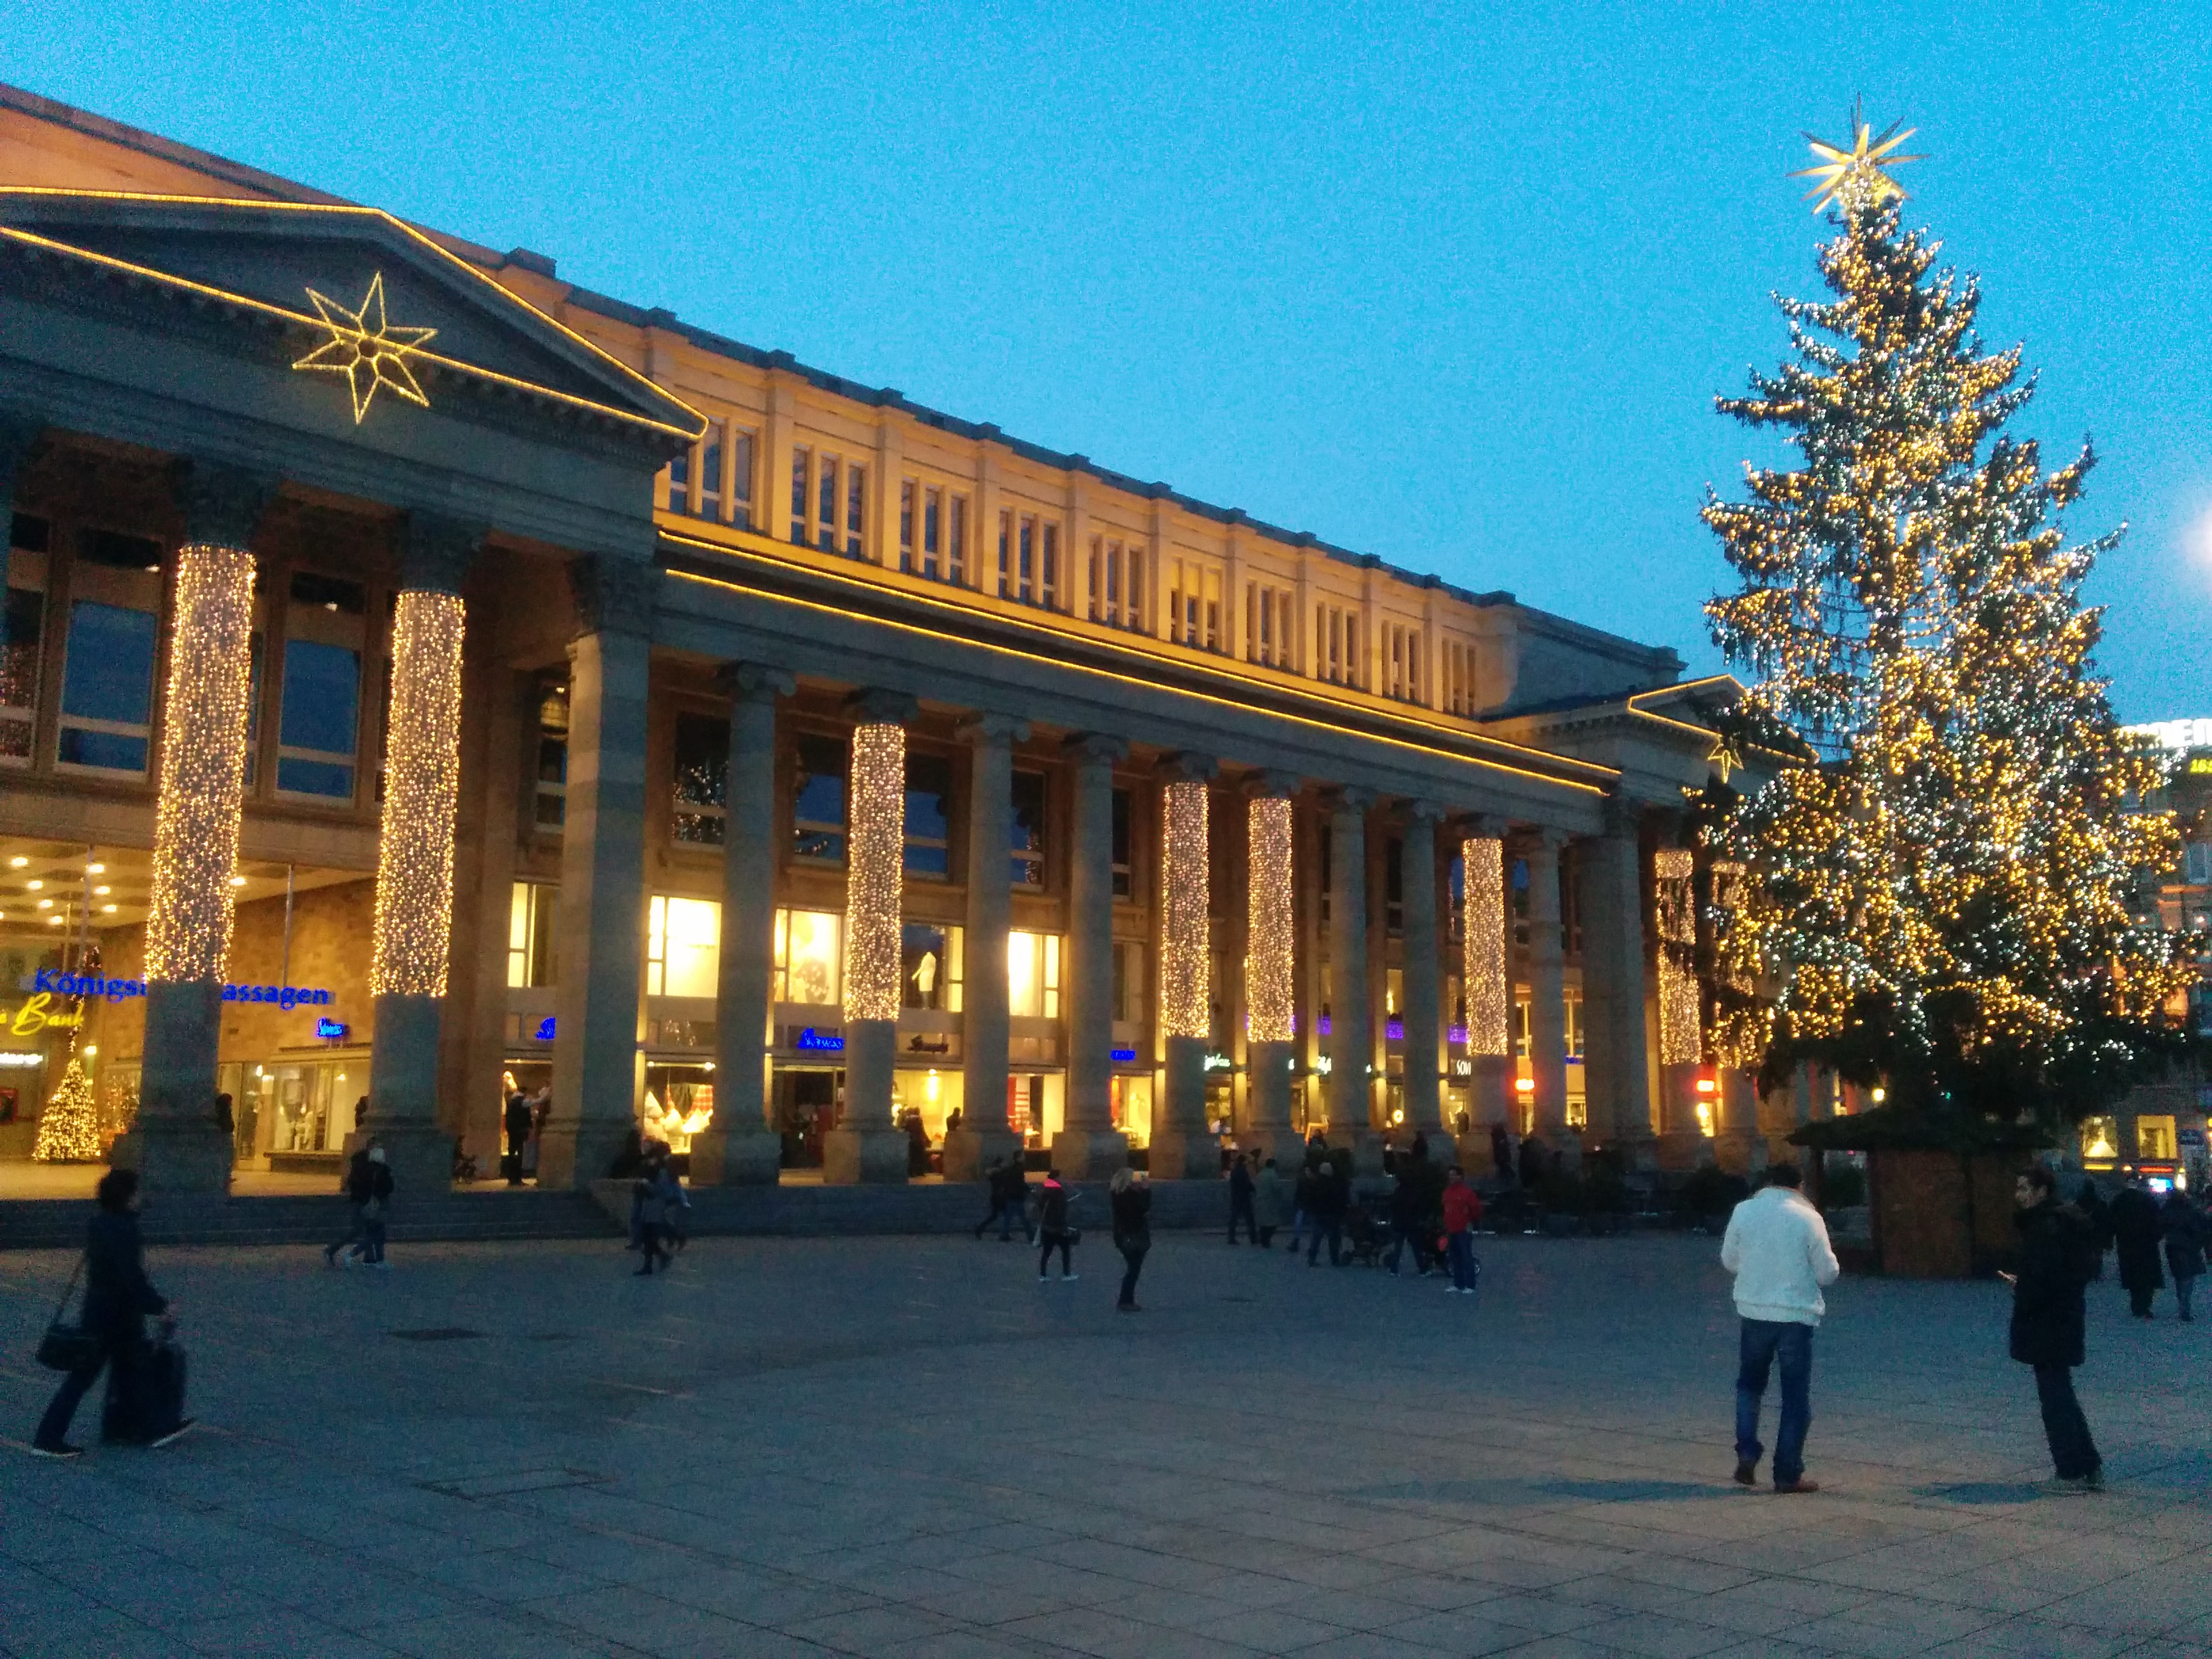 Christmas lights at the Schlossplatz.